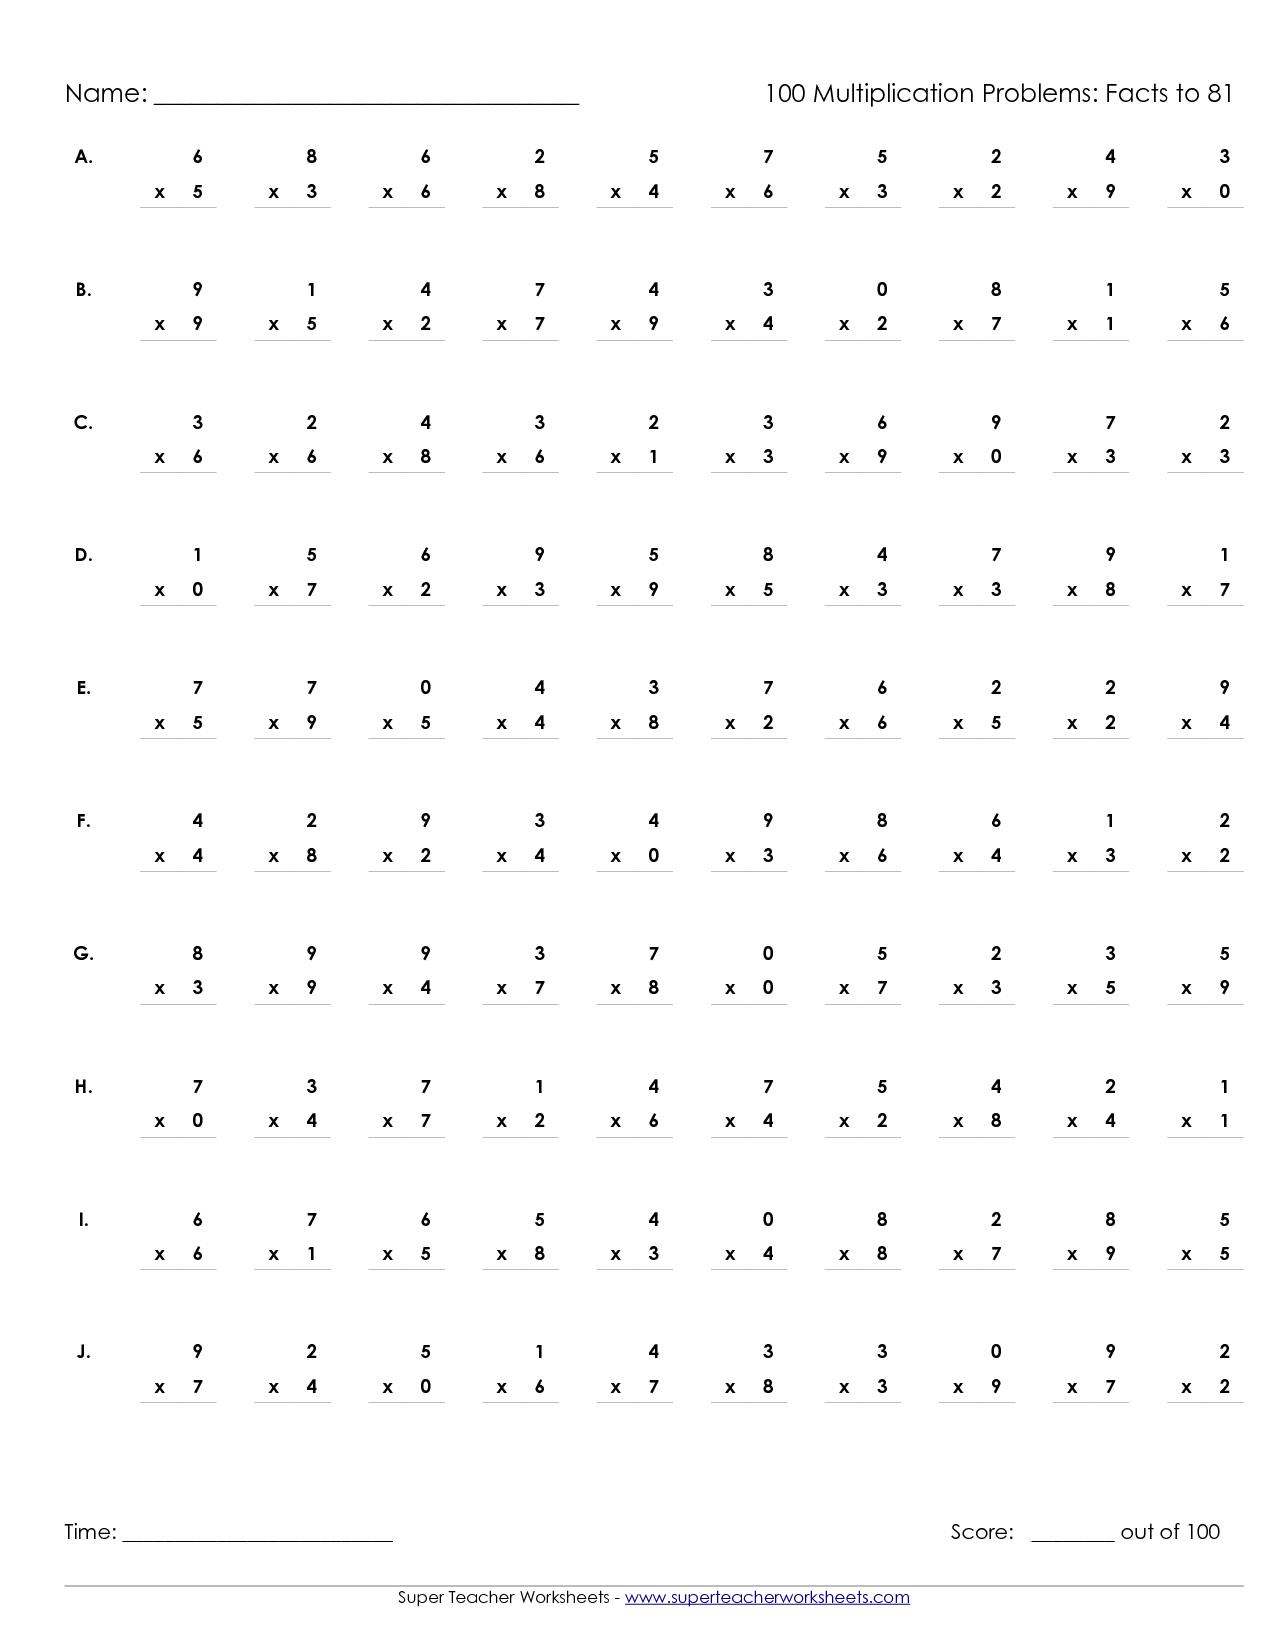 Printable Multiplication Worksheets 100 Problems | Math' S - Free Printable Multiplication Timed Tests